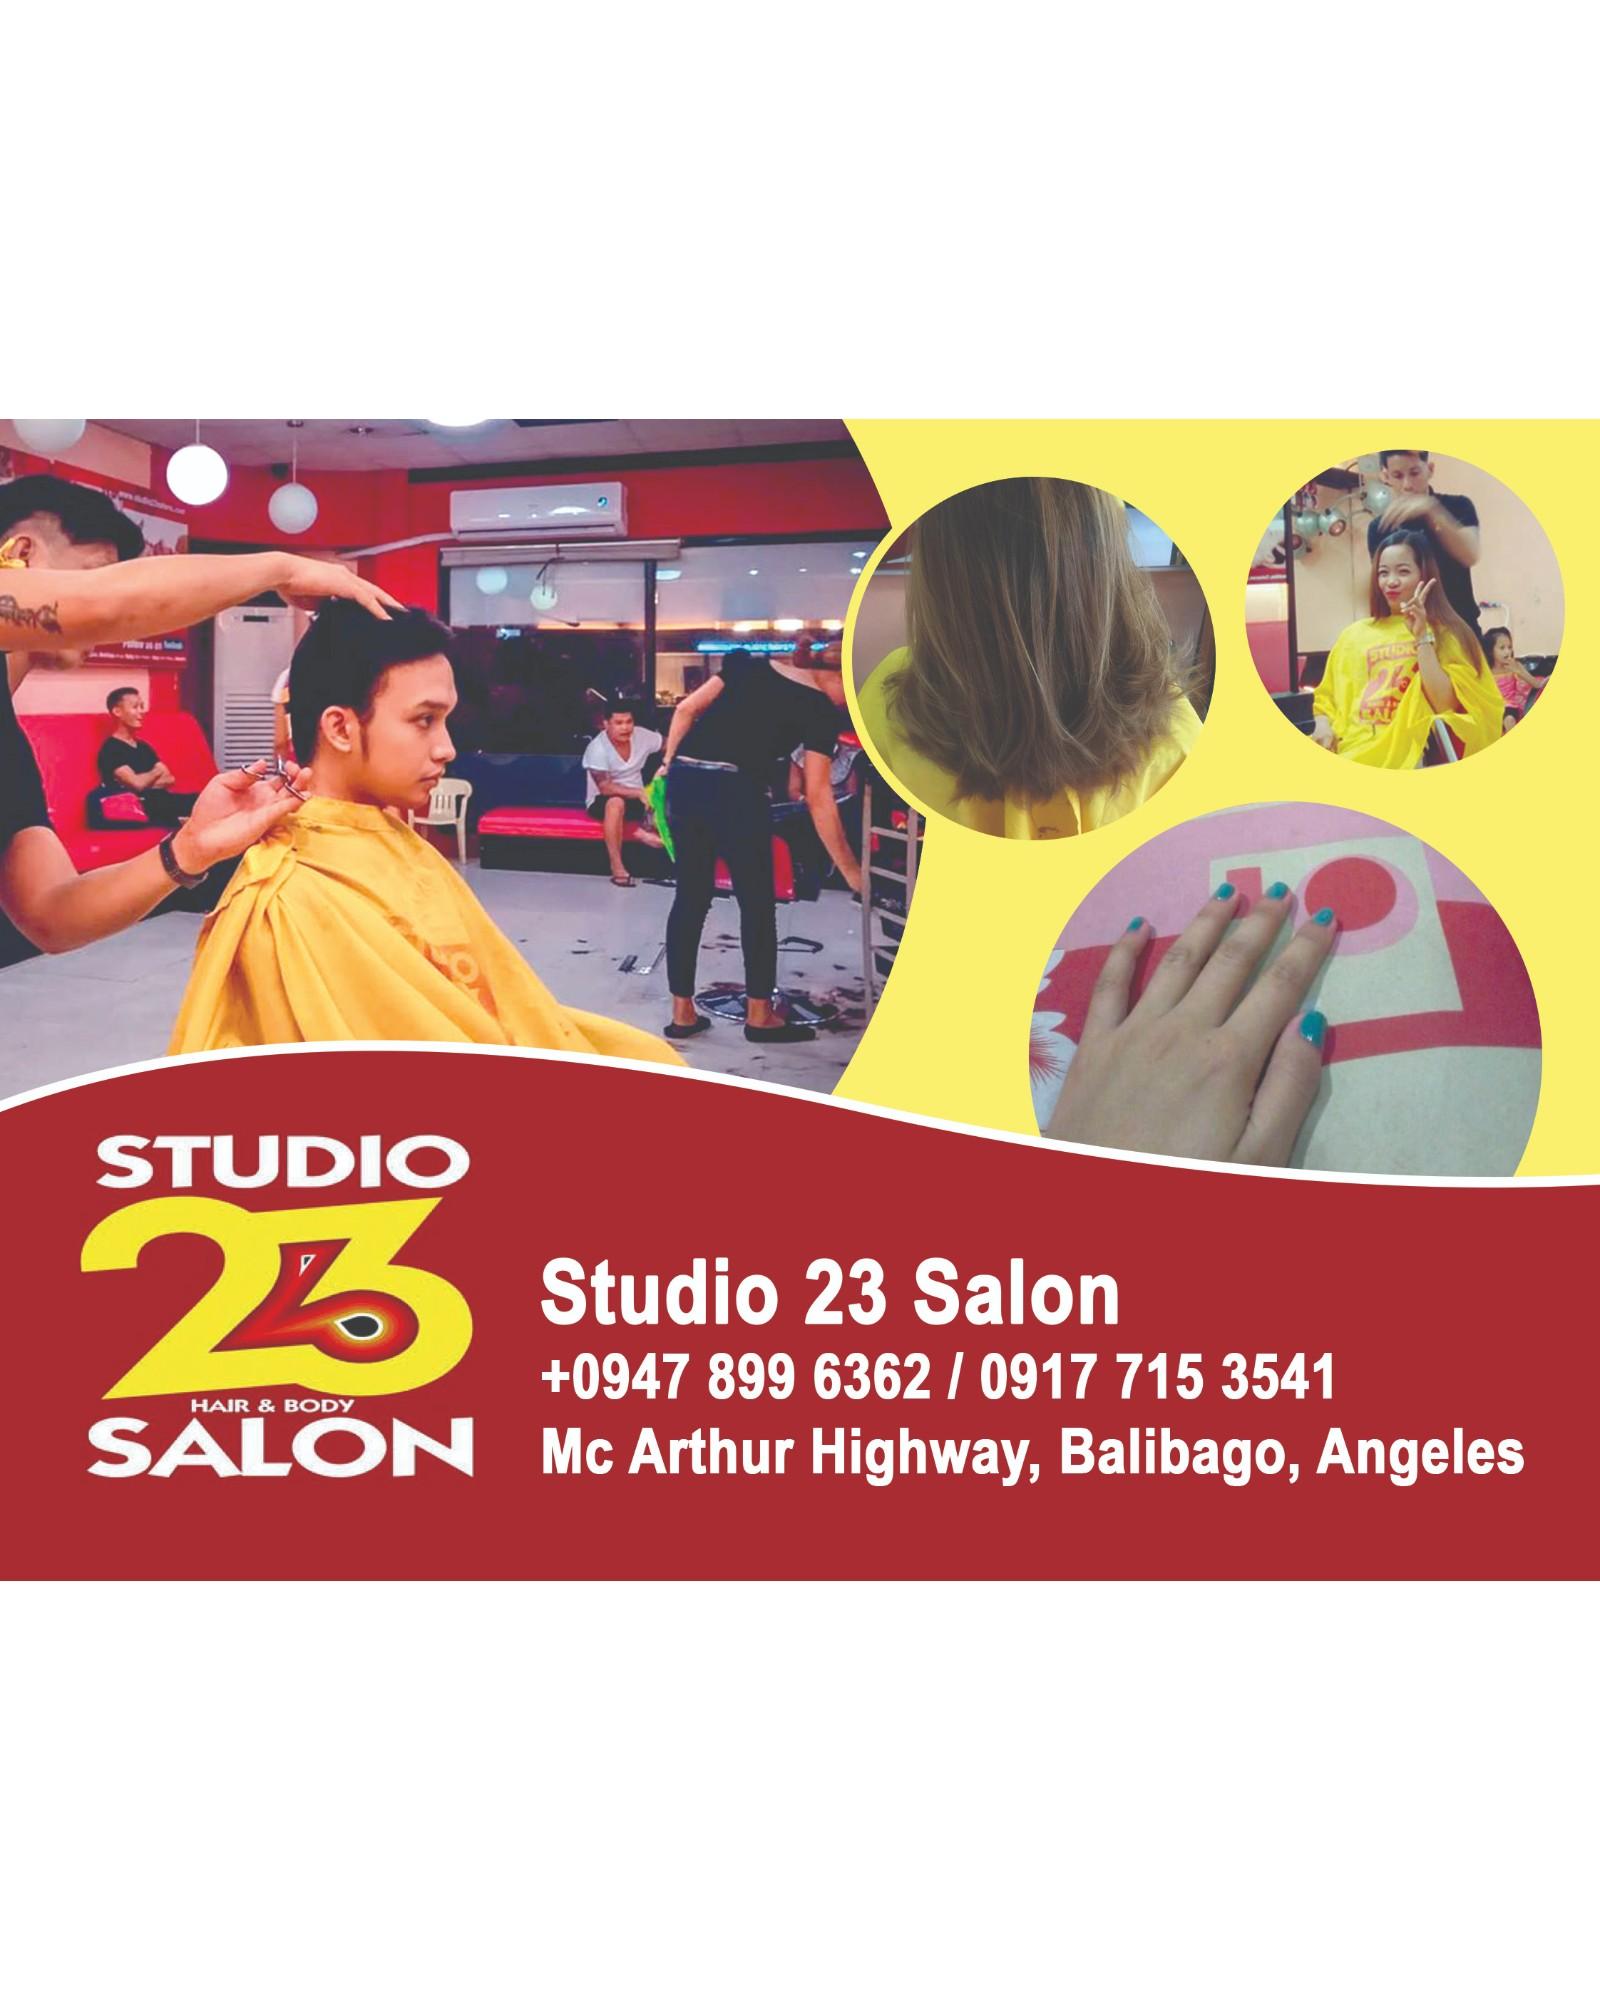 Studio 23 Salon